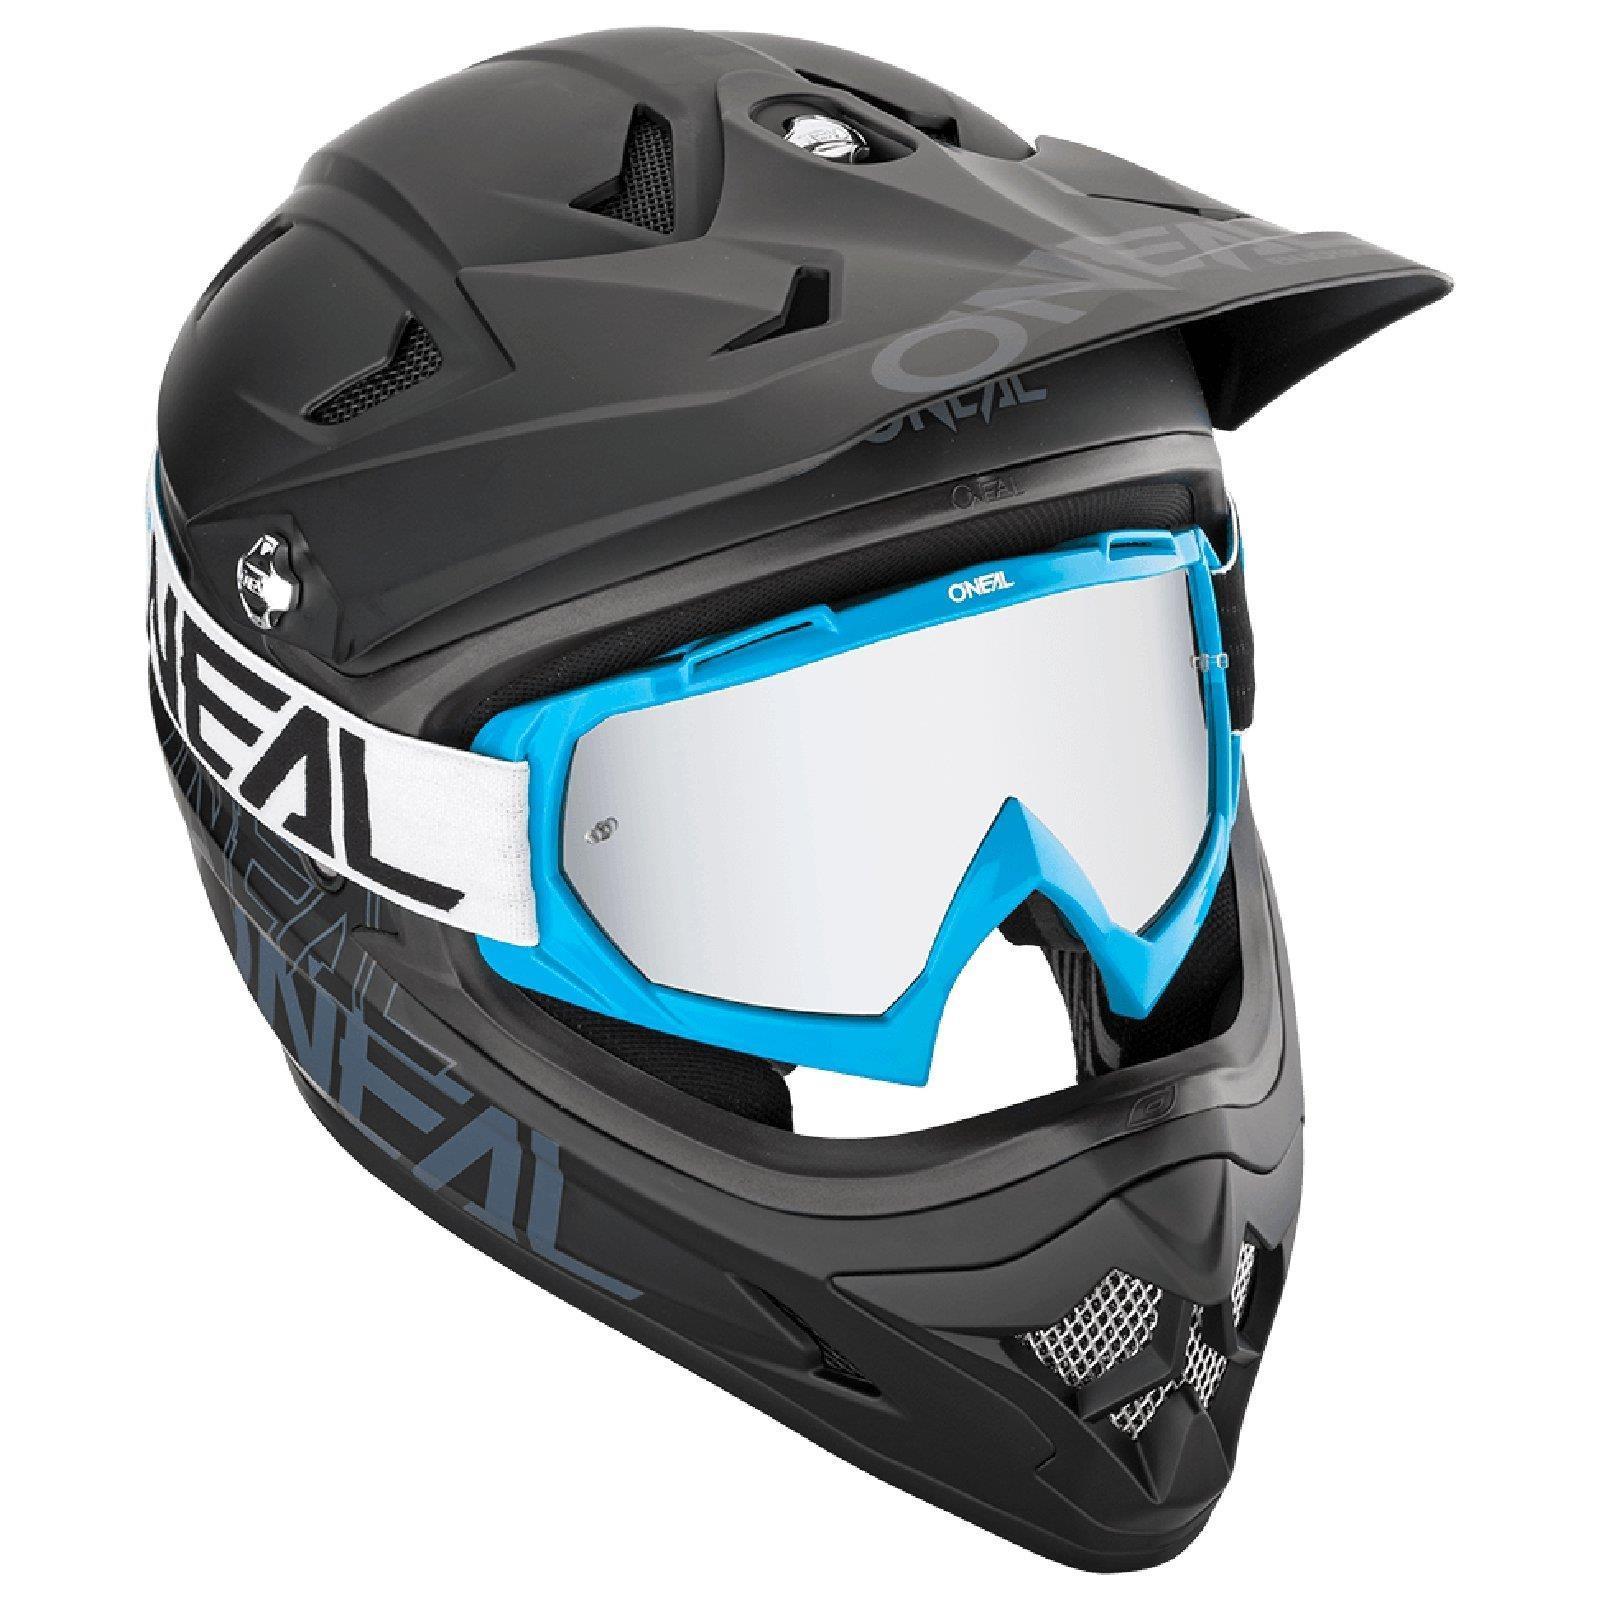 miniatuur 7 - O'Neal B-10 Goggle Twoface MX Brille Verspiegelt Silber Moto Cross Downhill MTB